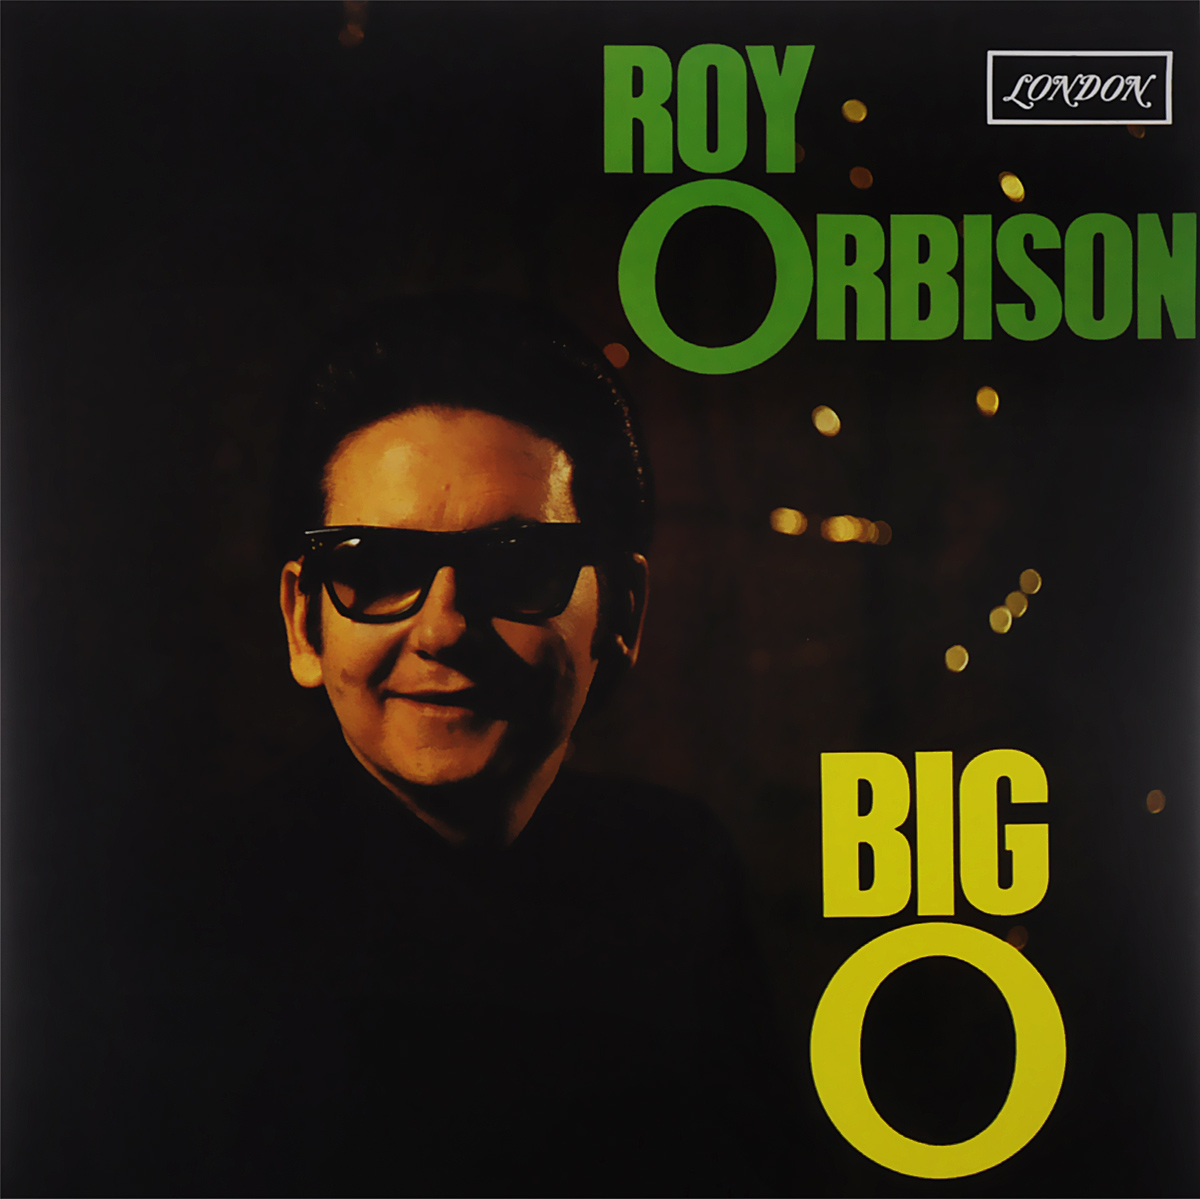 Рой Орбисон Roy Orbison. Big O (LP) смартфон philips x588 black mediatek mt6750 1 5 32 gb 3 gb 5 1280x720 dualsim 3g 4g bt android 6 0